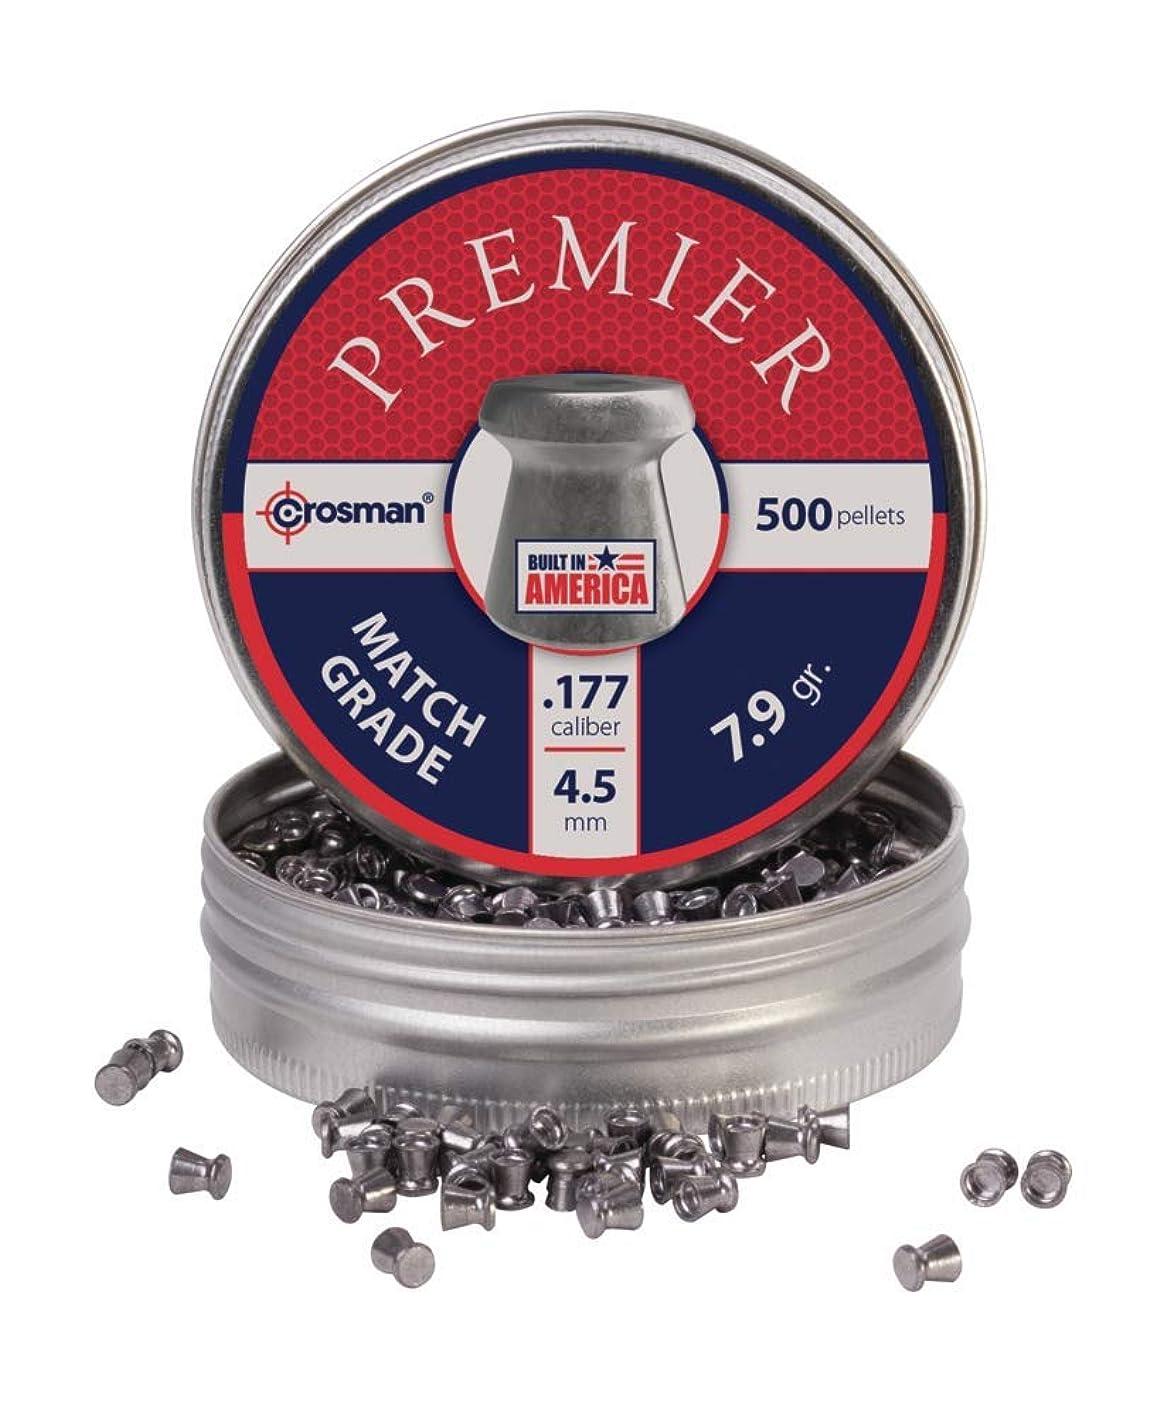 Crosman Premier Match 500 match grade pellets in a tin. LM77 wcstoxbjqiy517